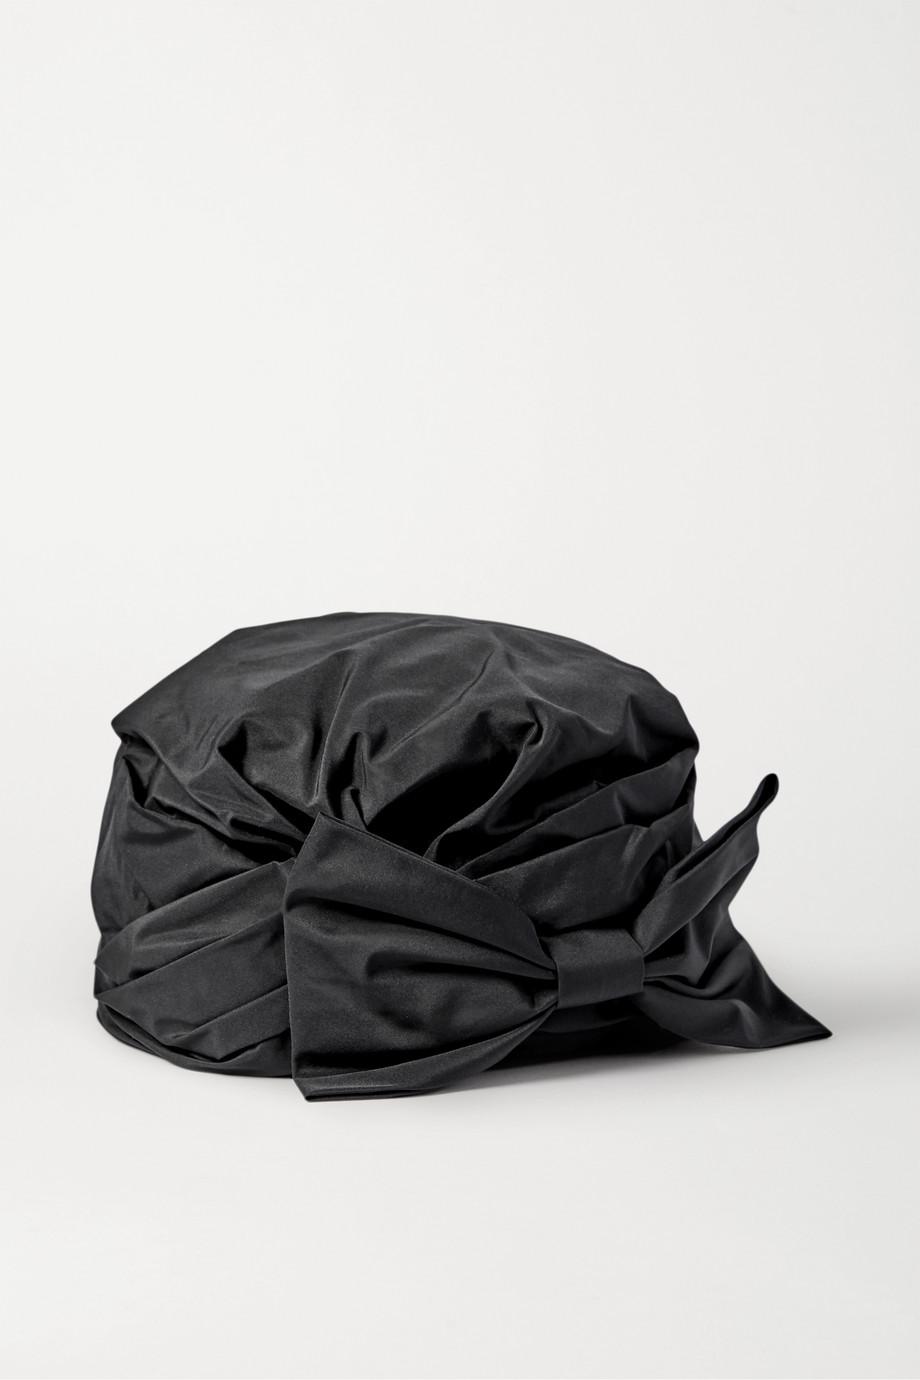 Maison Michel Zoe 蝴蝶结缀饰塔夫绸包头巾